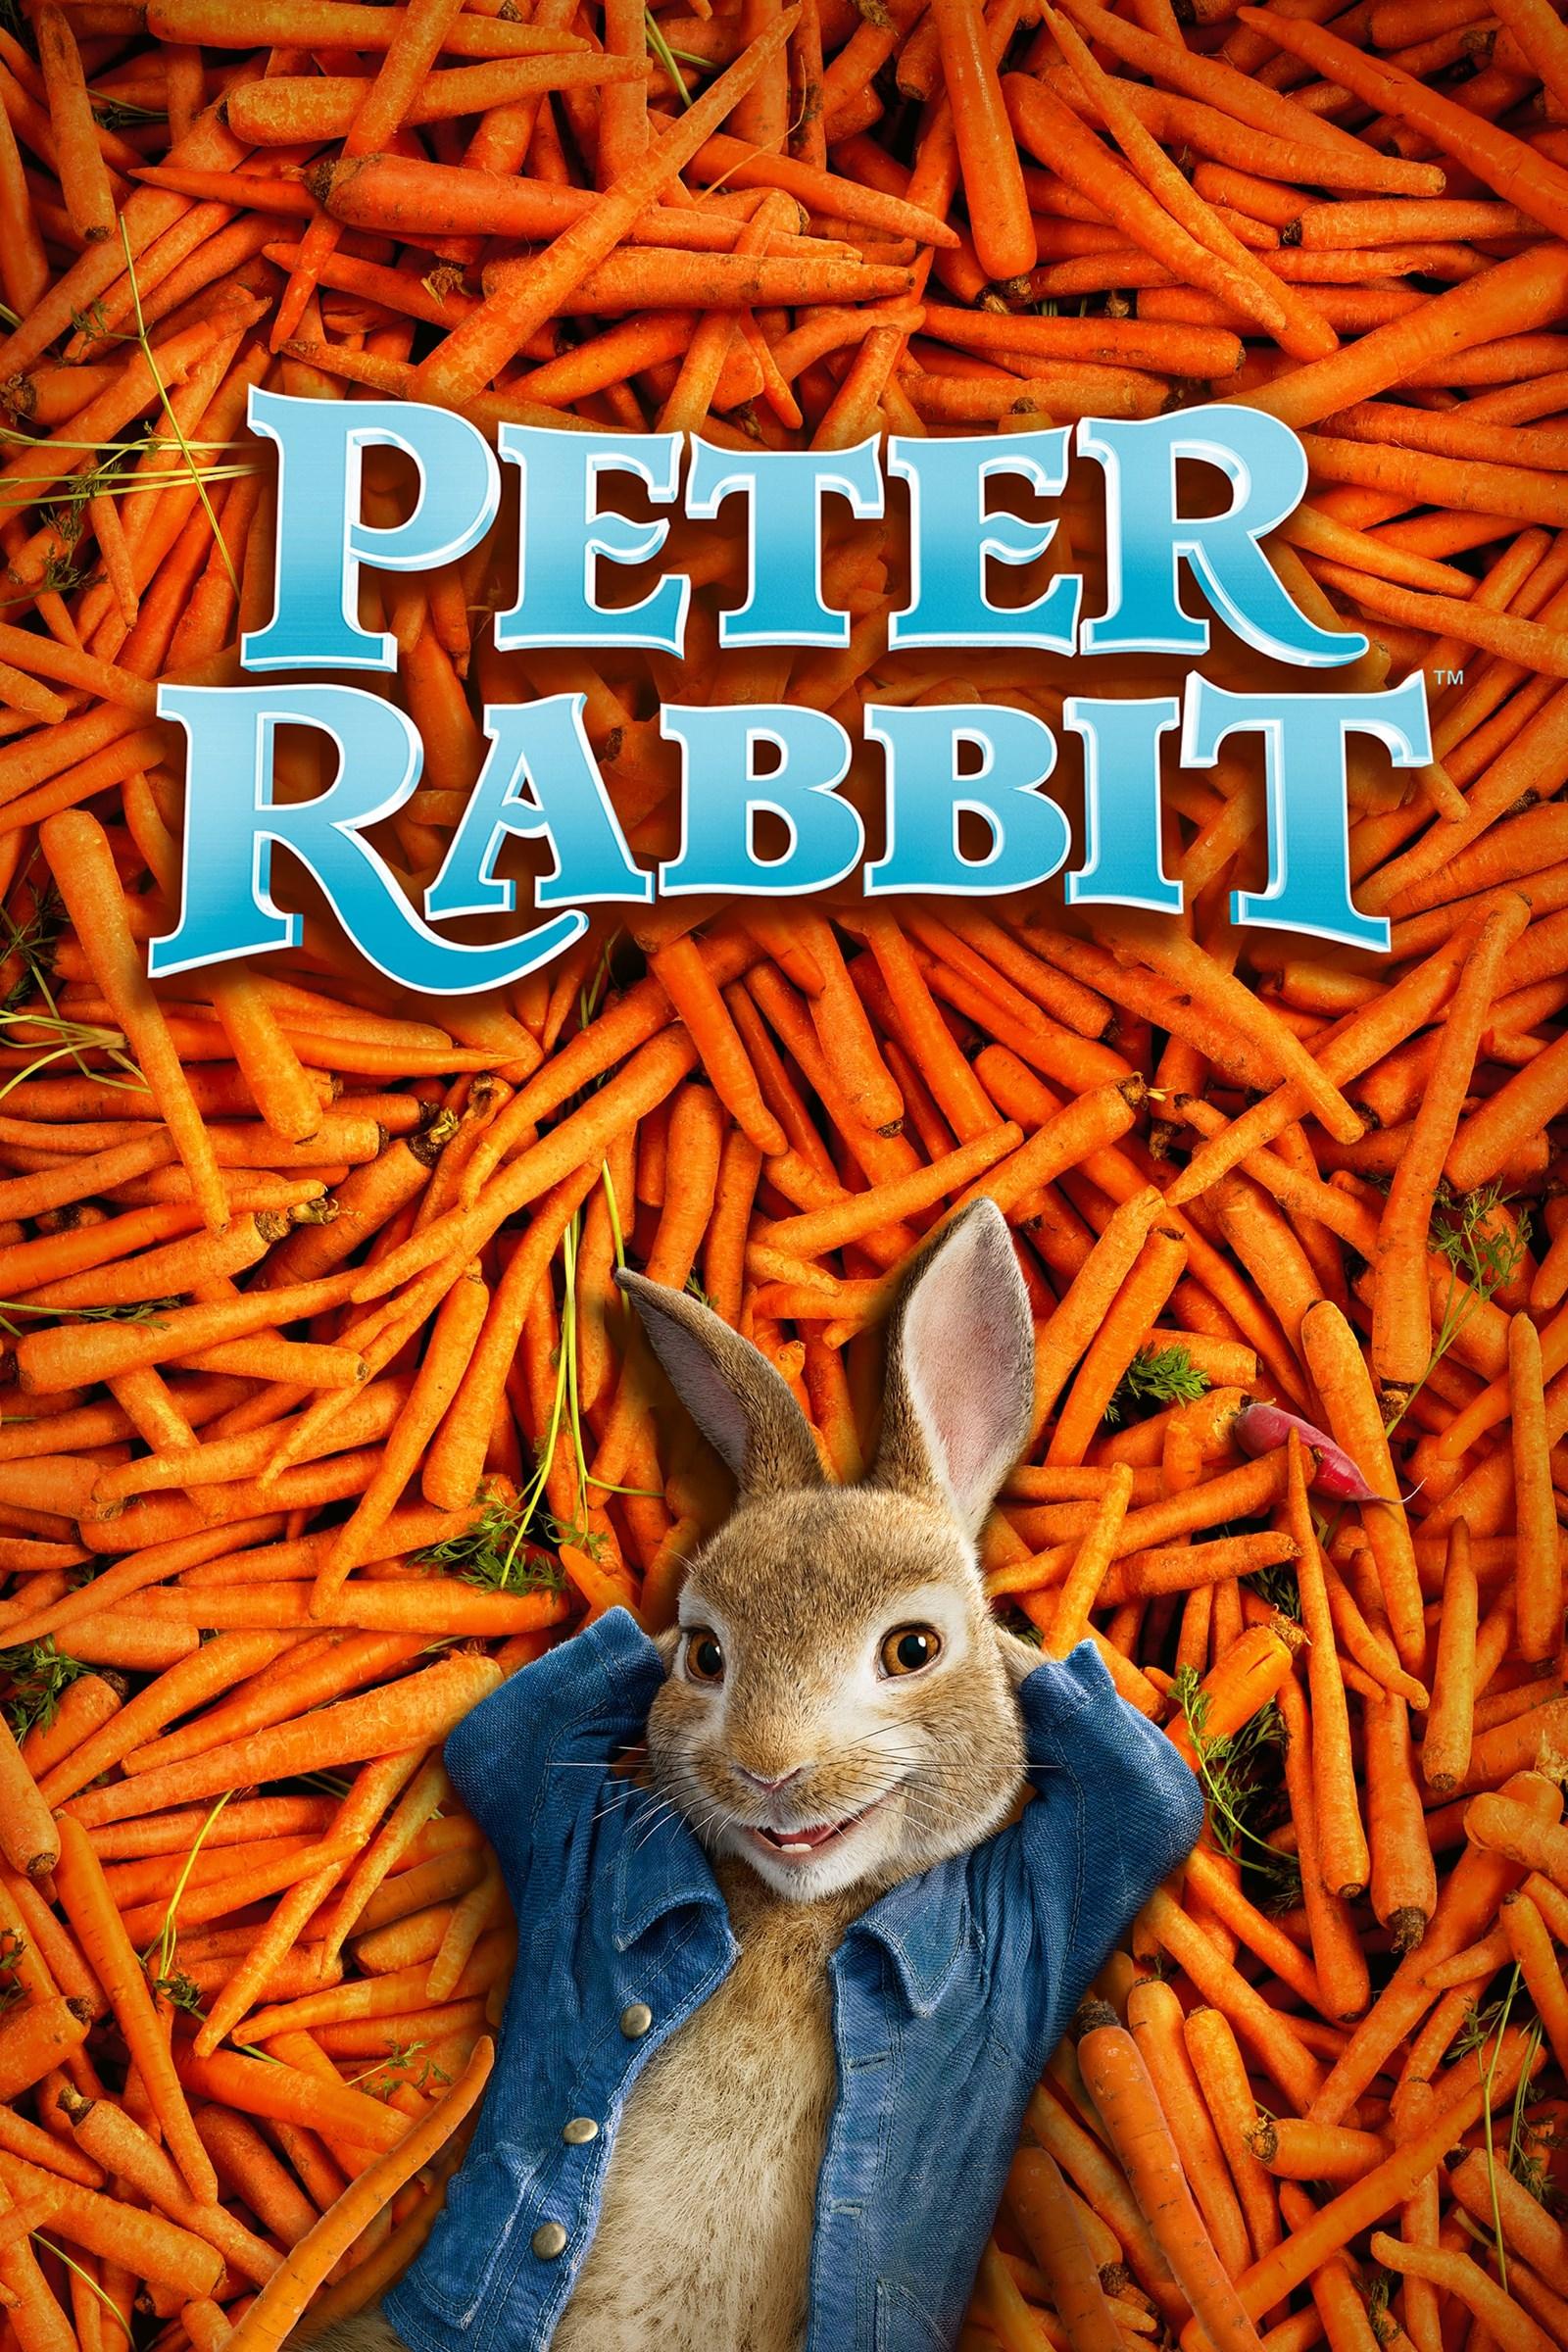 Peter Rabbit (2018) Bluray Subtitle Indonesia